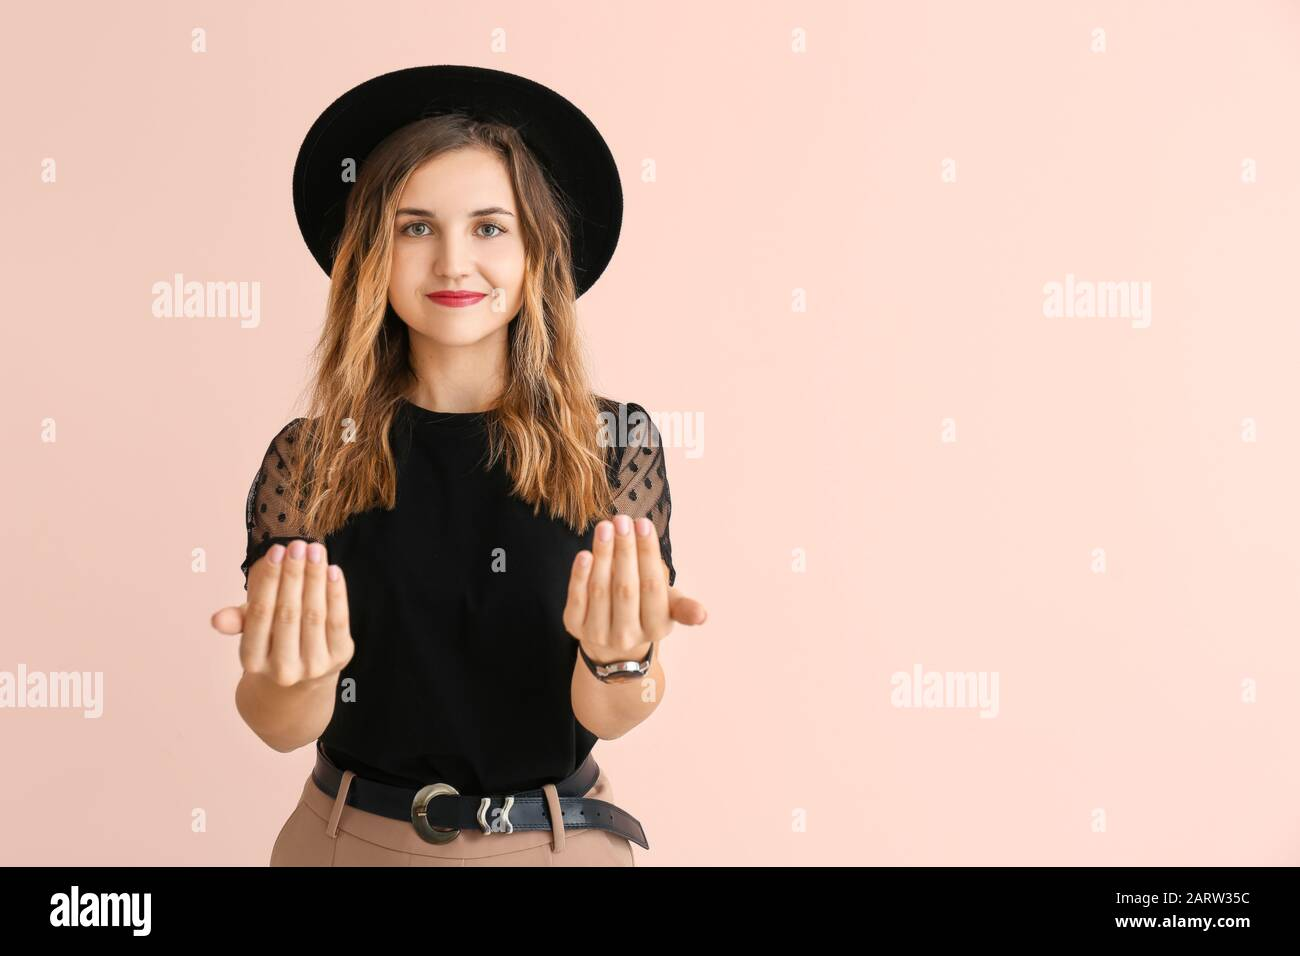 Beckoning Hand Sign Immagini e Fotos Stock Alamy